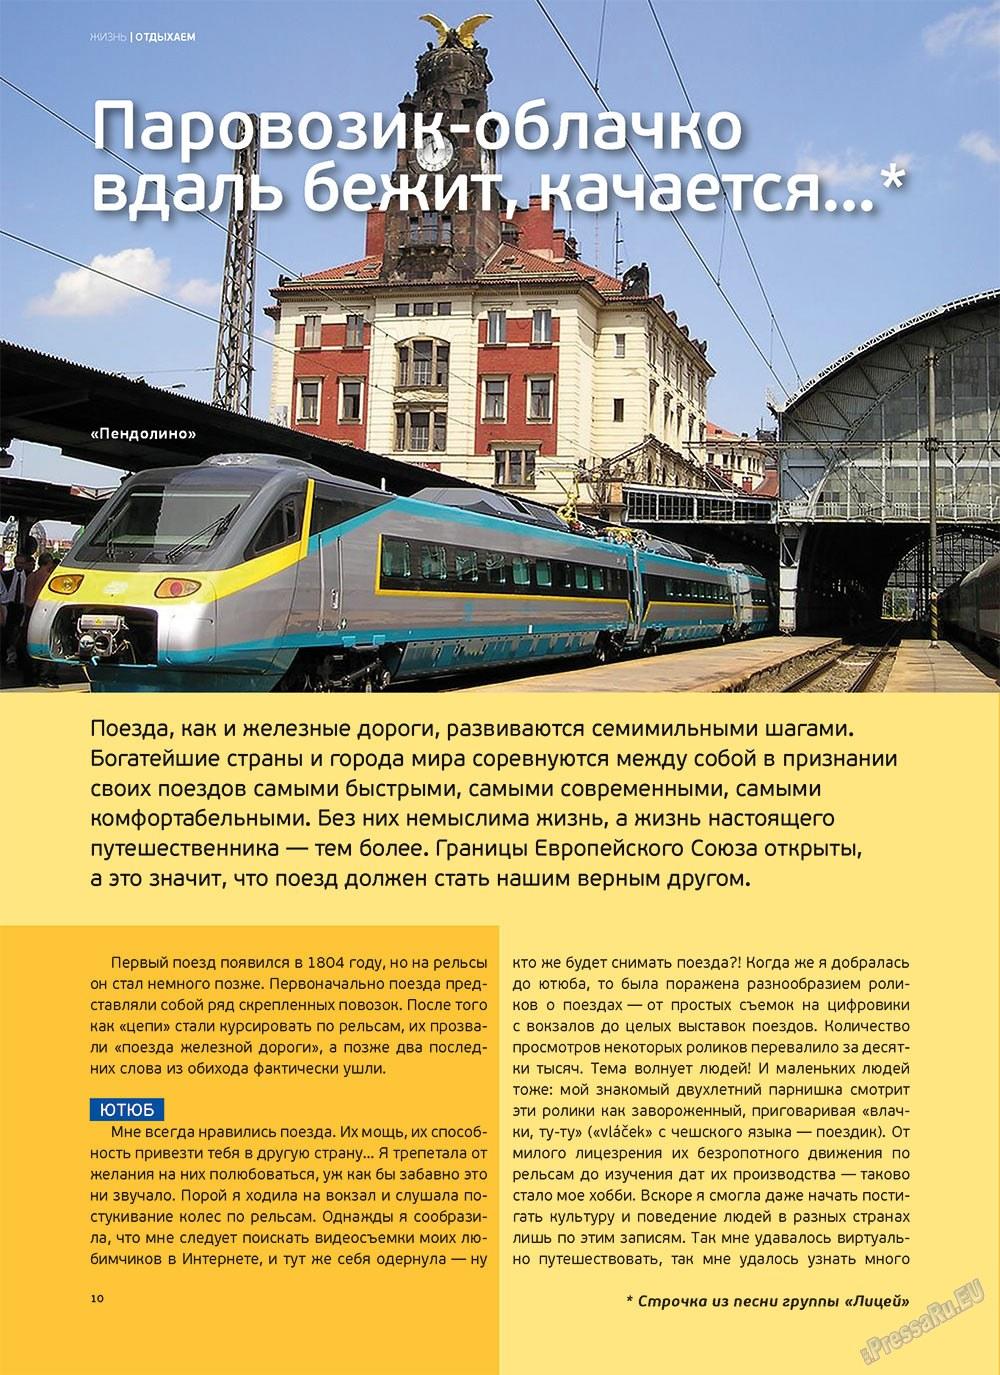 Артек (журнал). 2012 год, номер 6, стр. 12